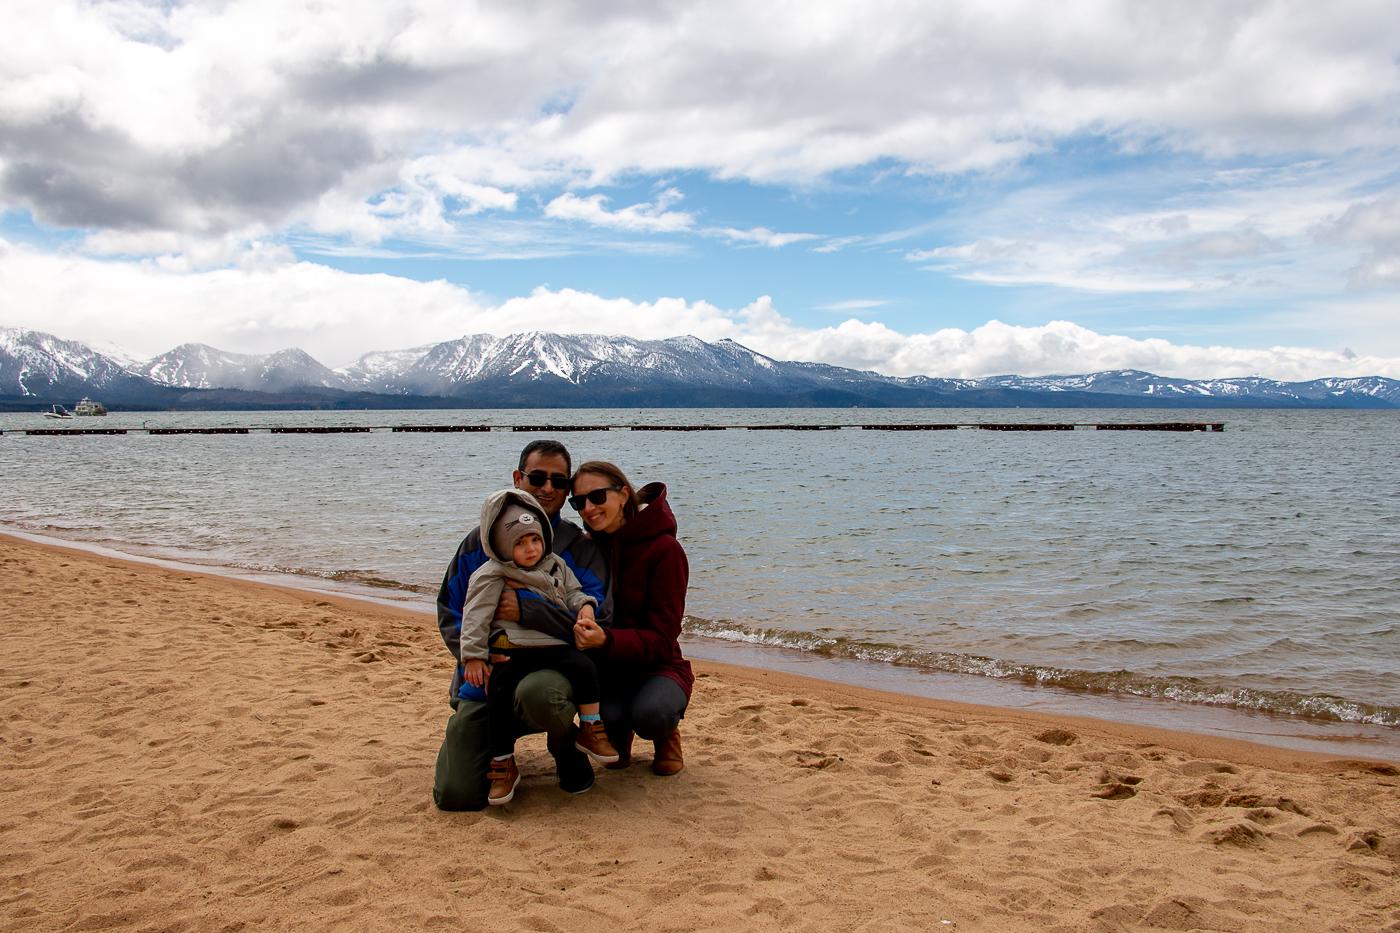 South Lake Tahoe, roadsanddestinations.com